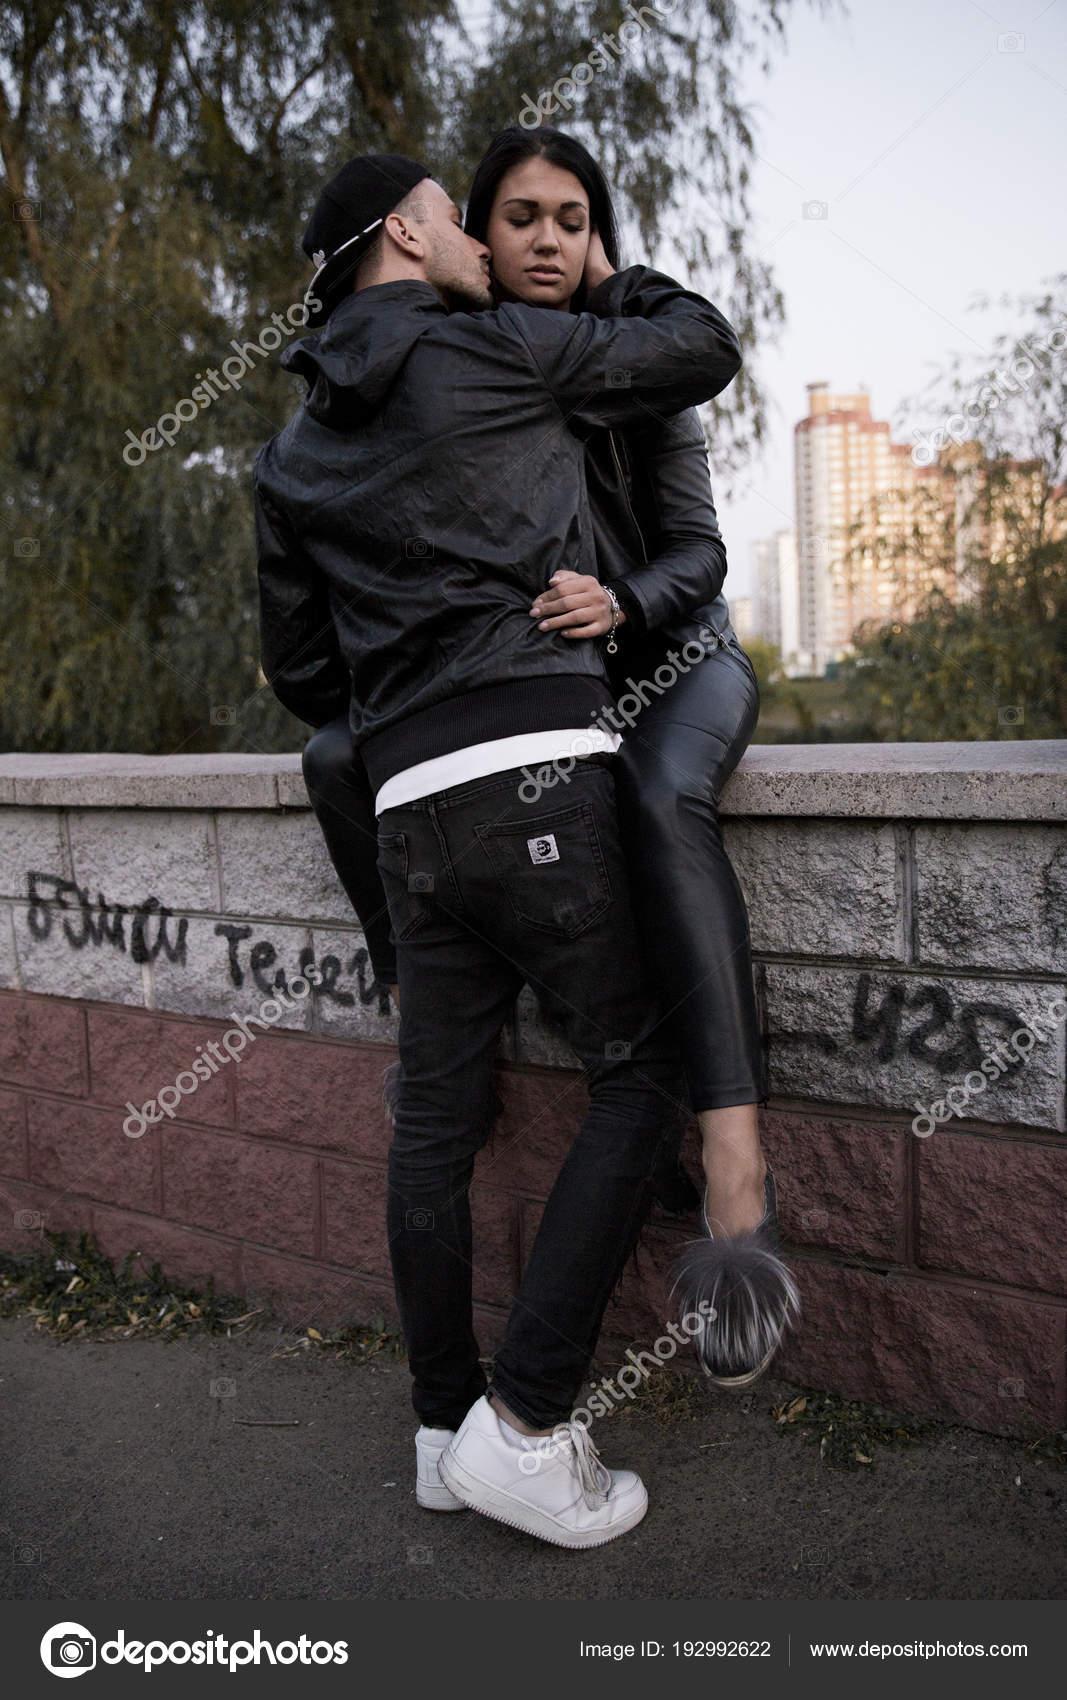 Ragazza nera dating UK